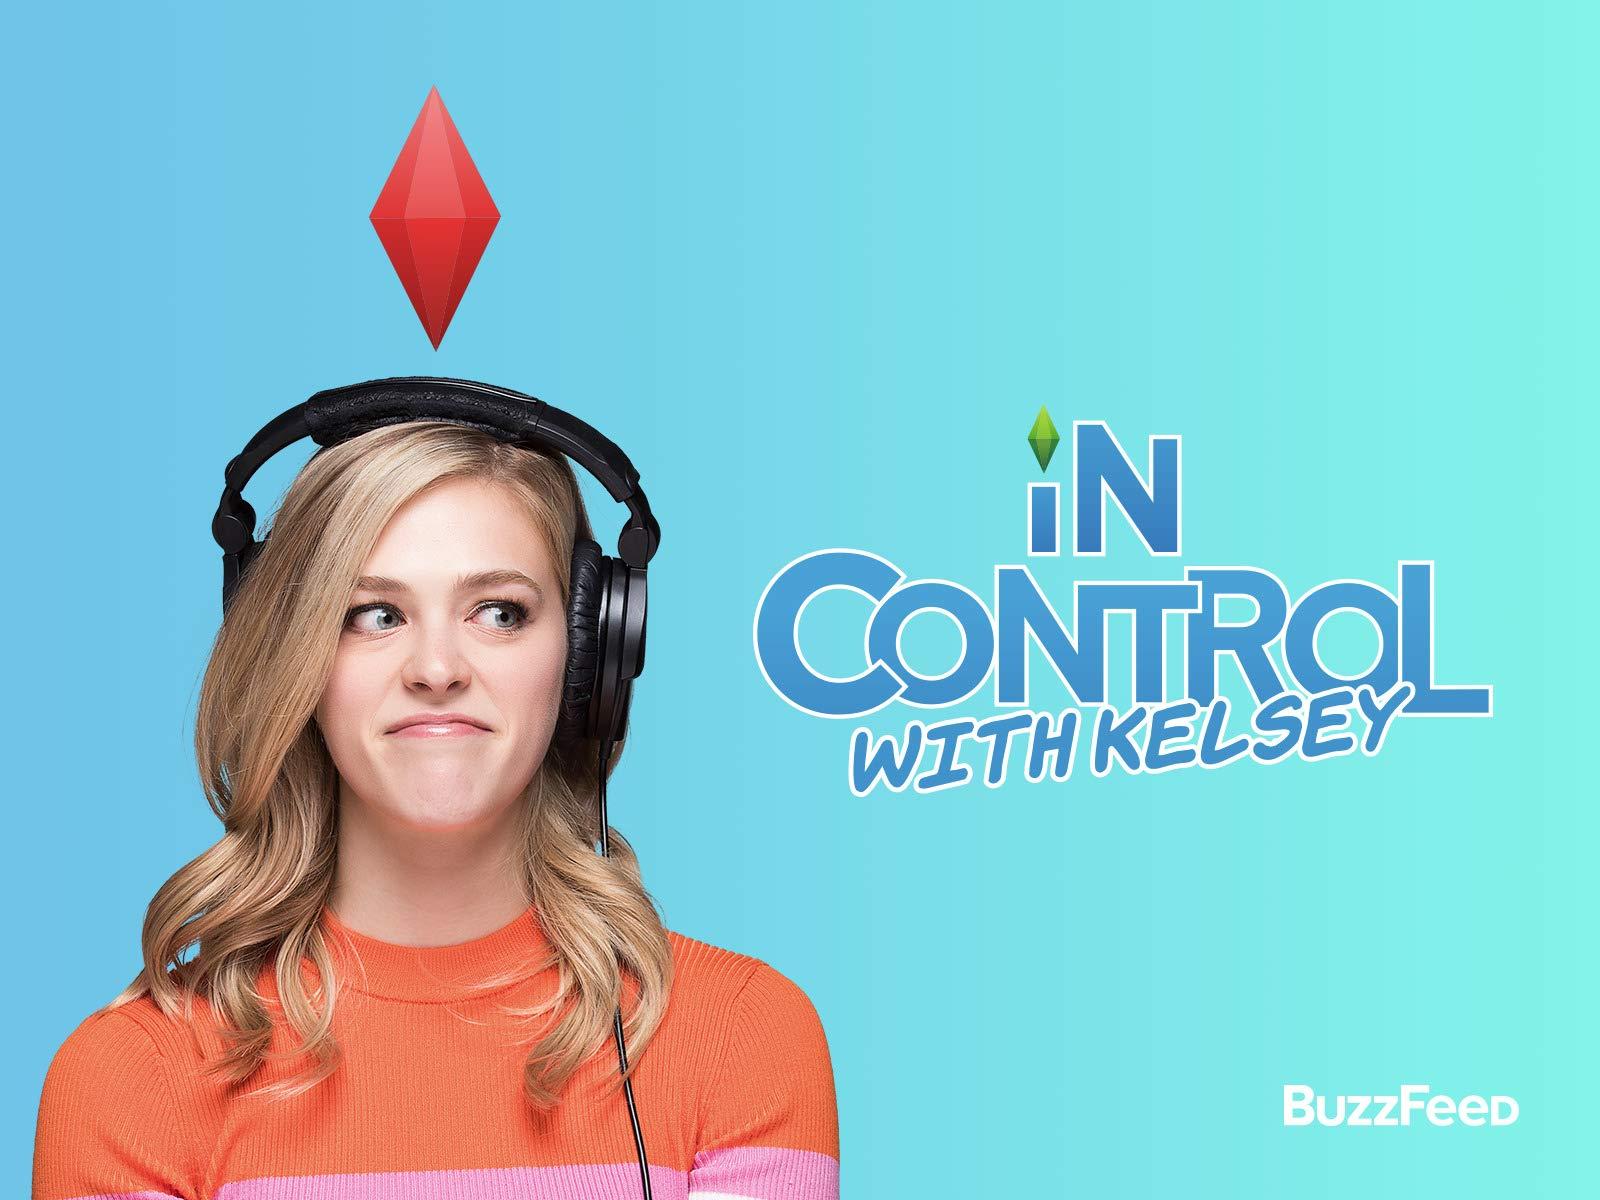 Kelsey Buzzfeed dating